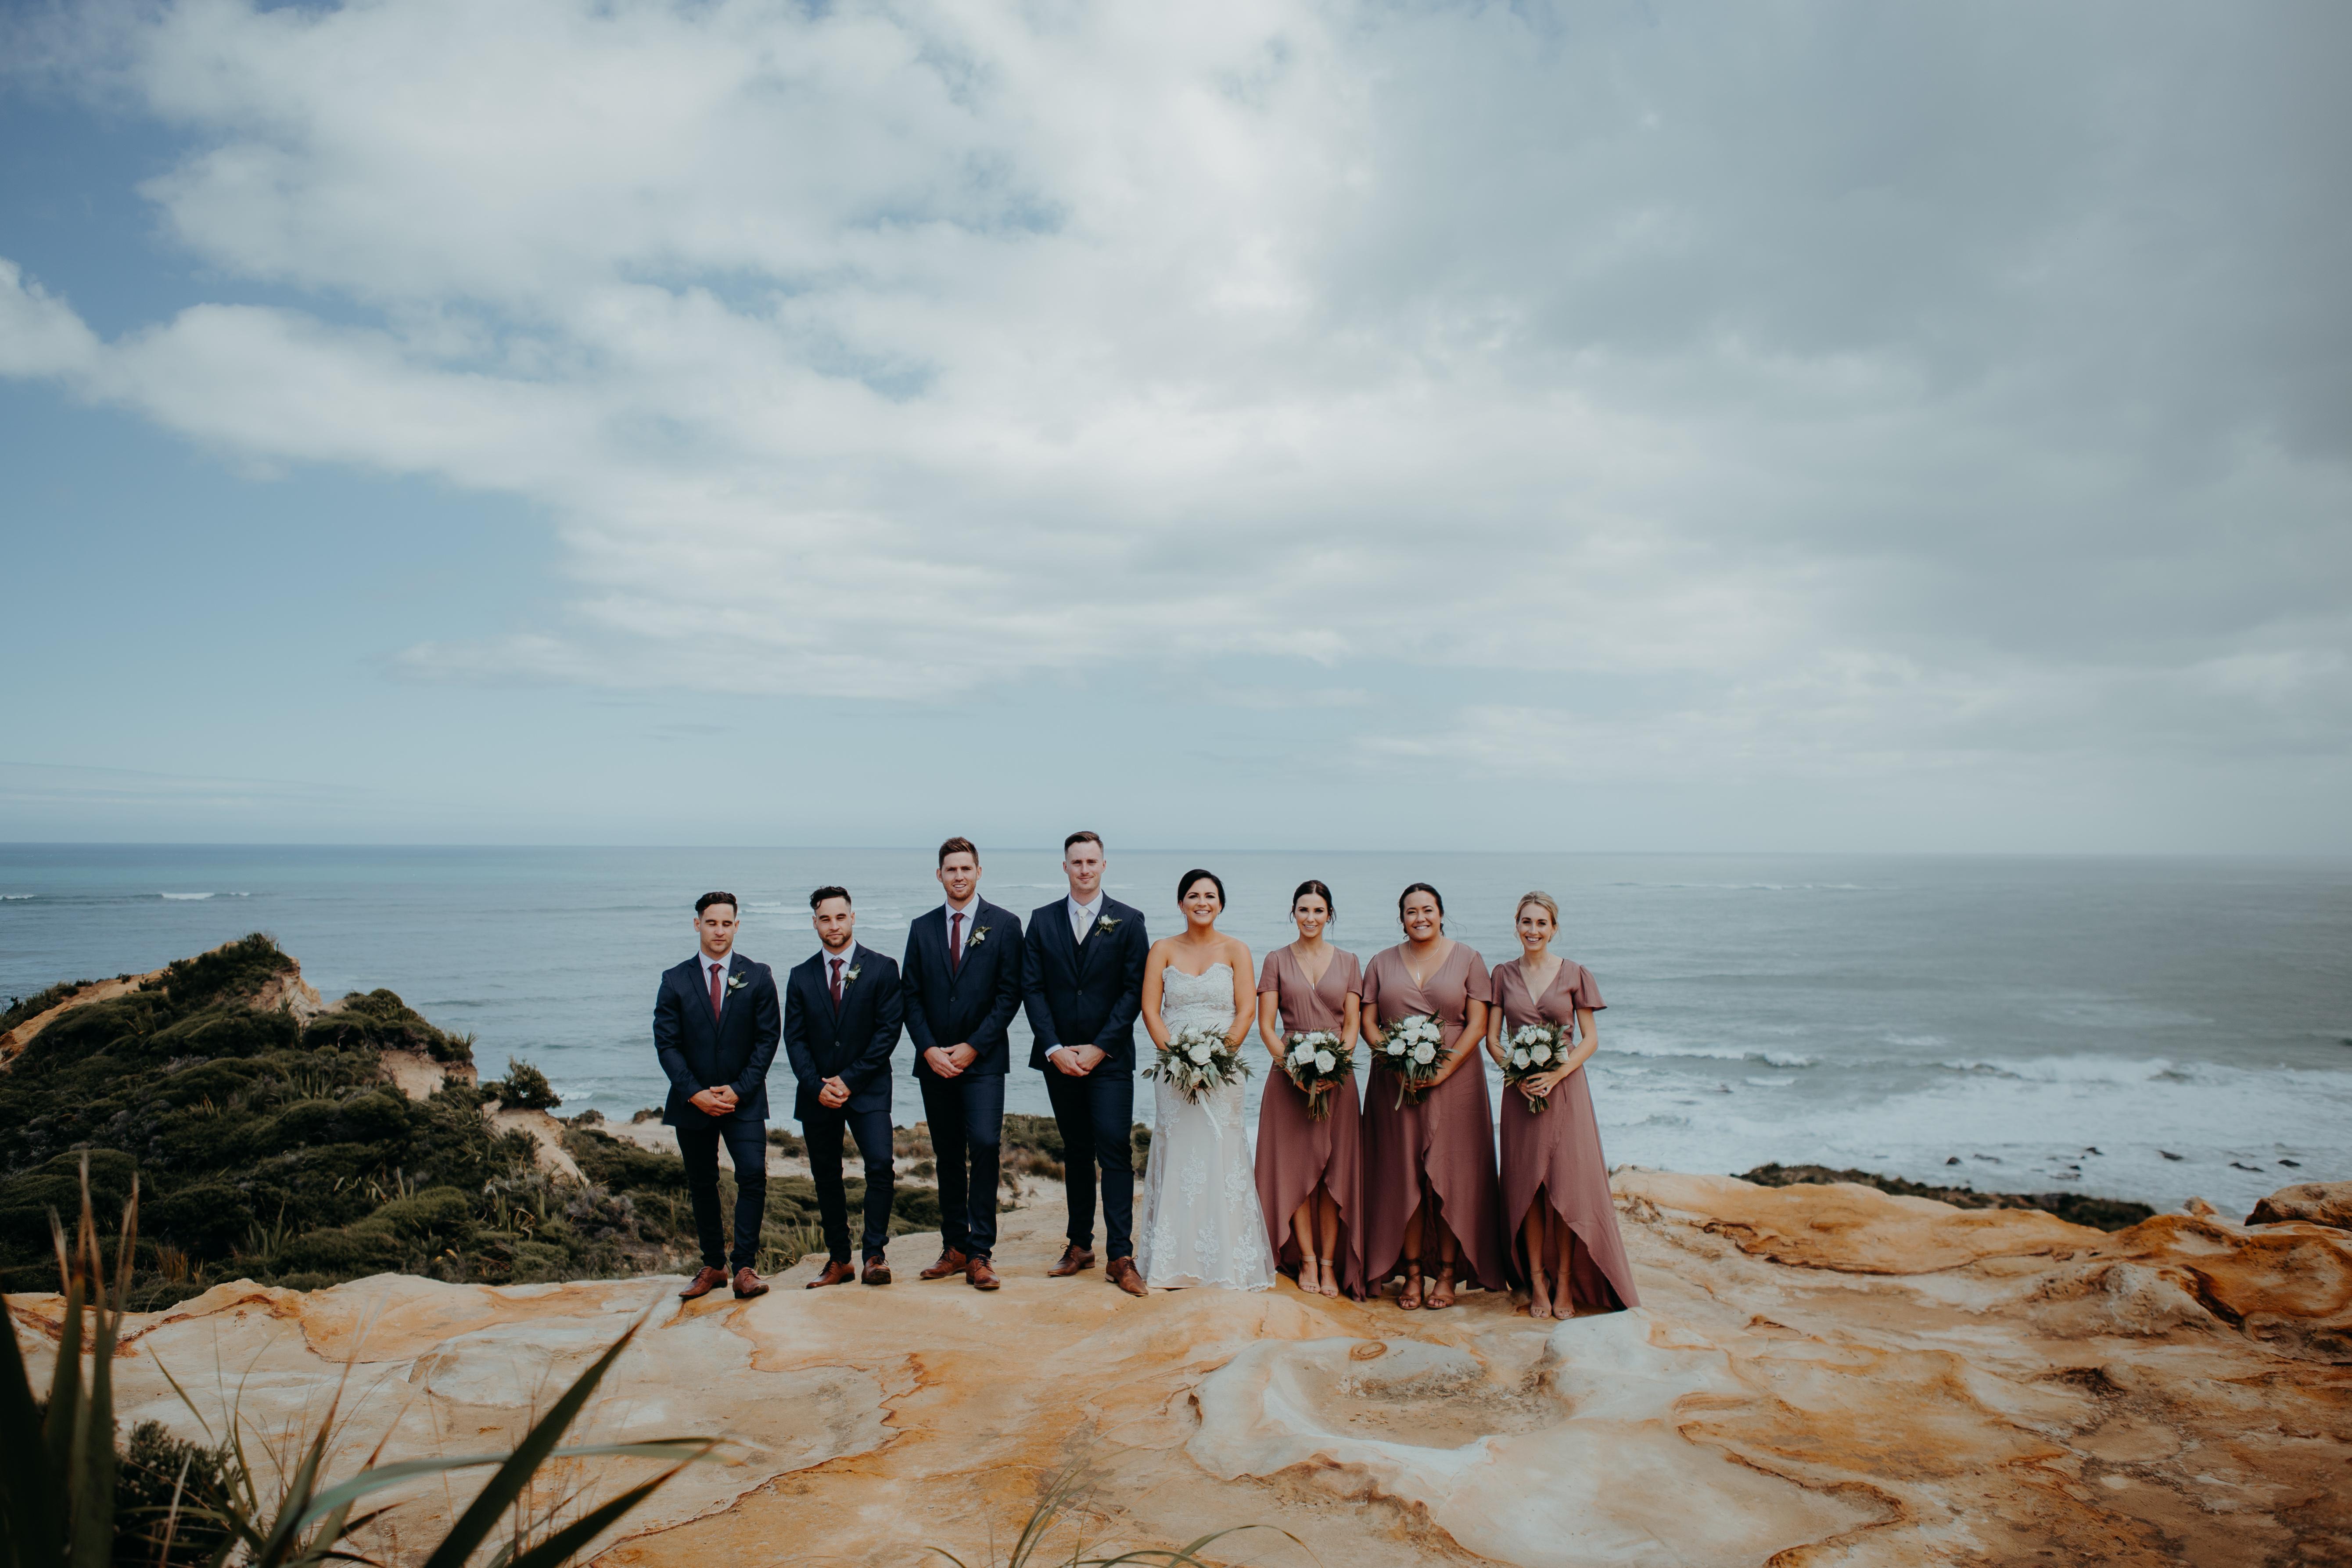 Omapere wedding photographer